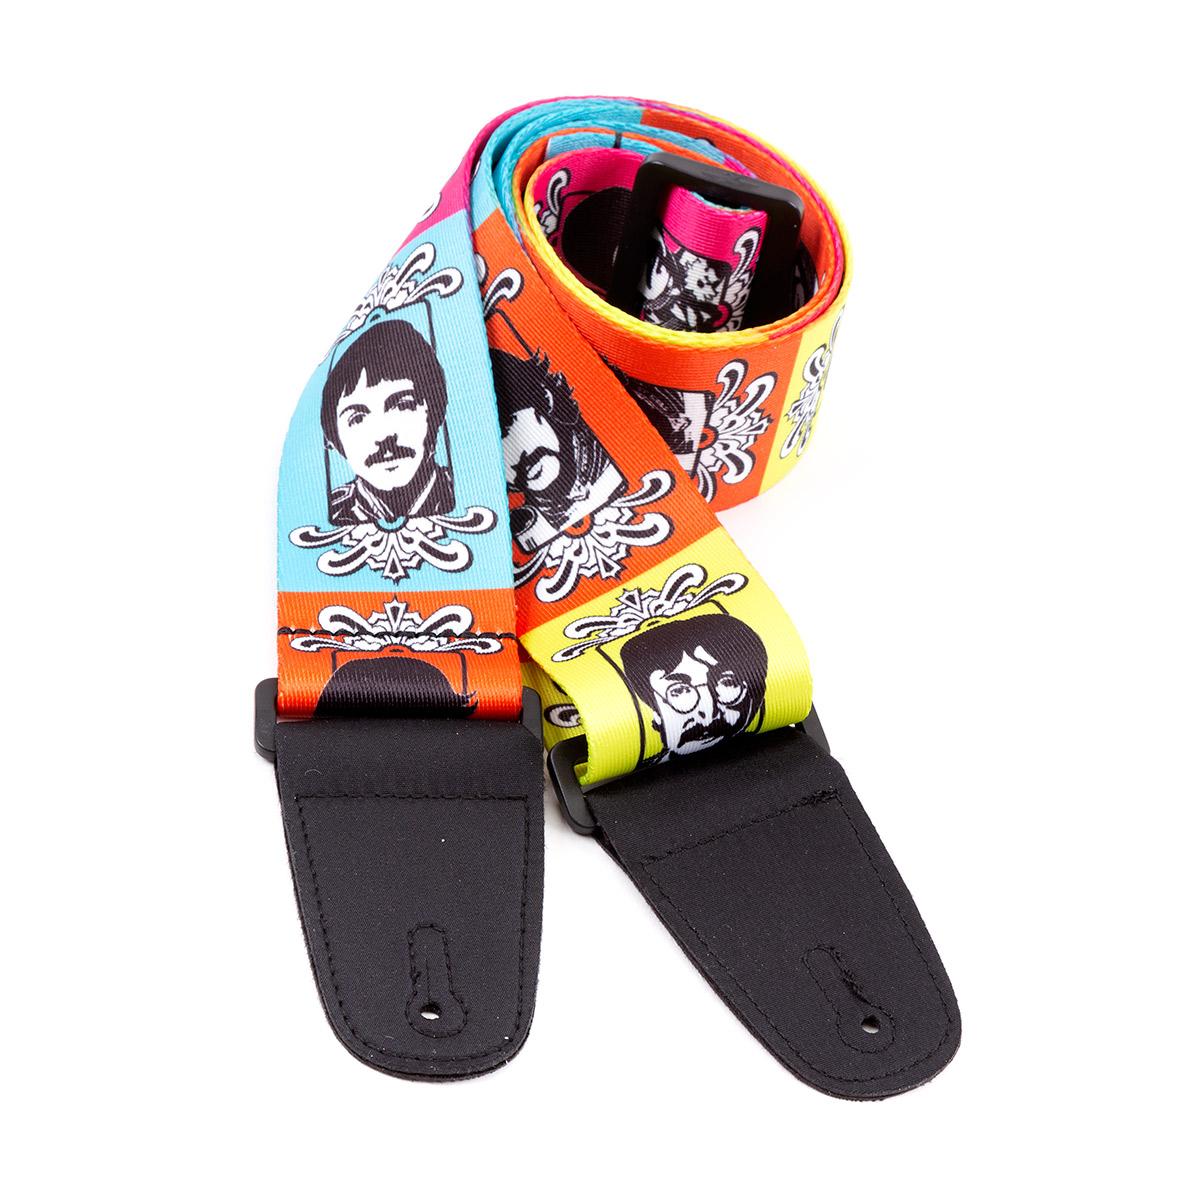 Sgt. Pepper D'Addario Guitar Strap